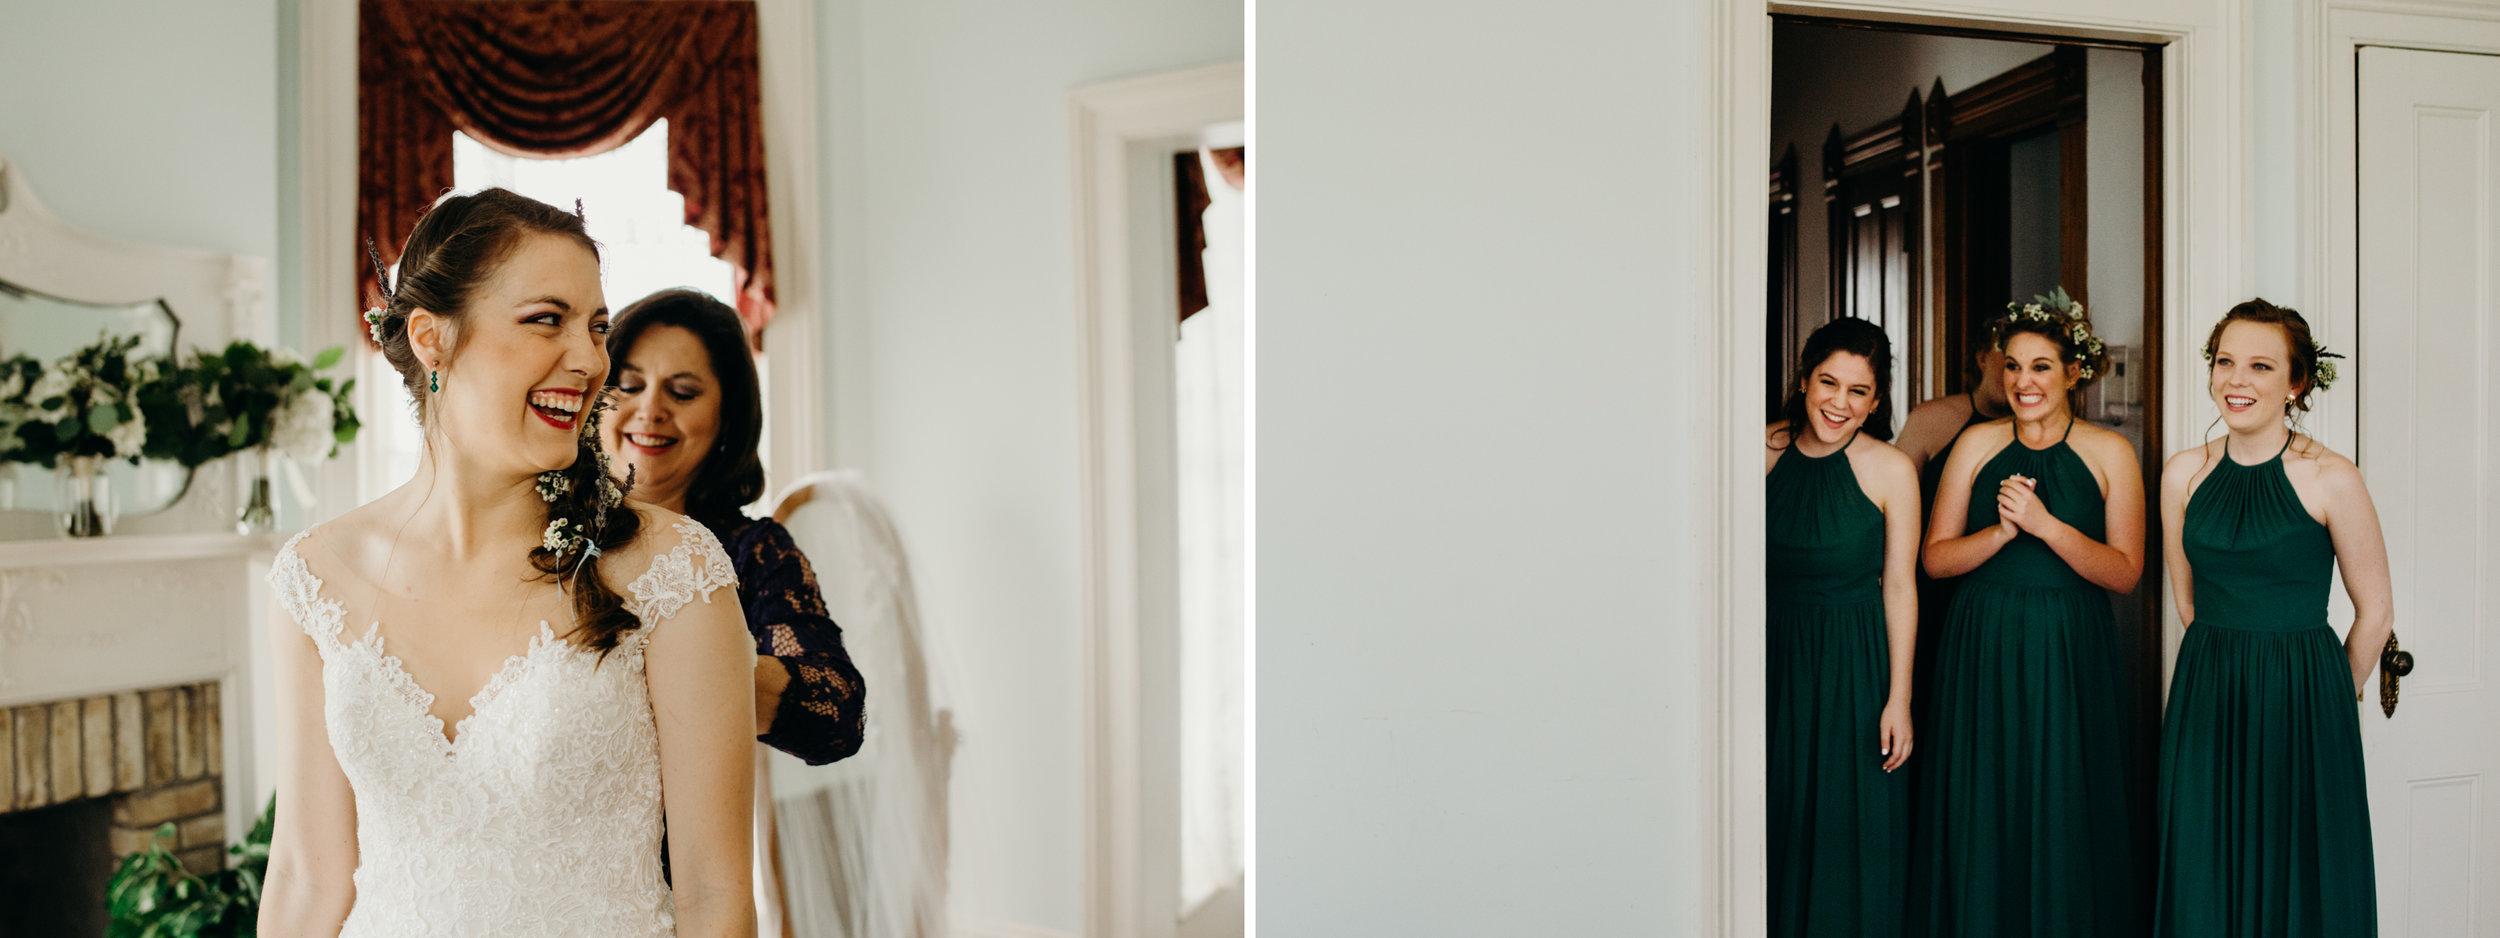 jenna: BM reveal.jpg